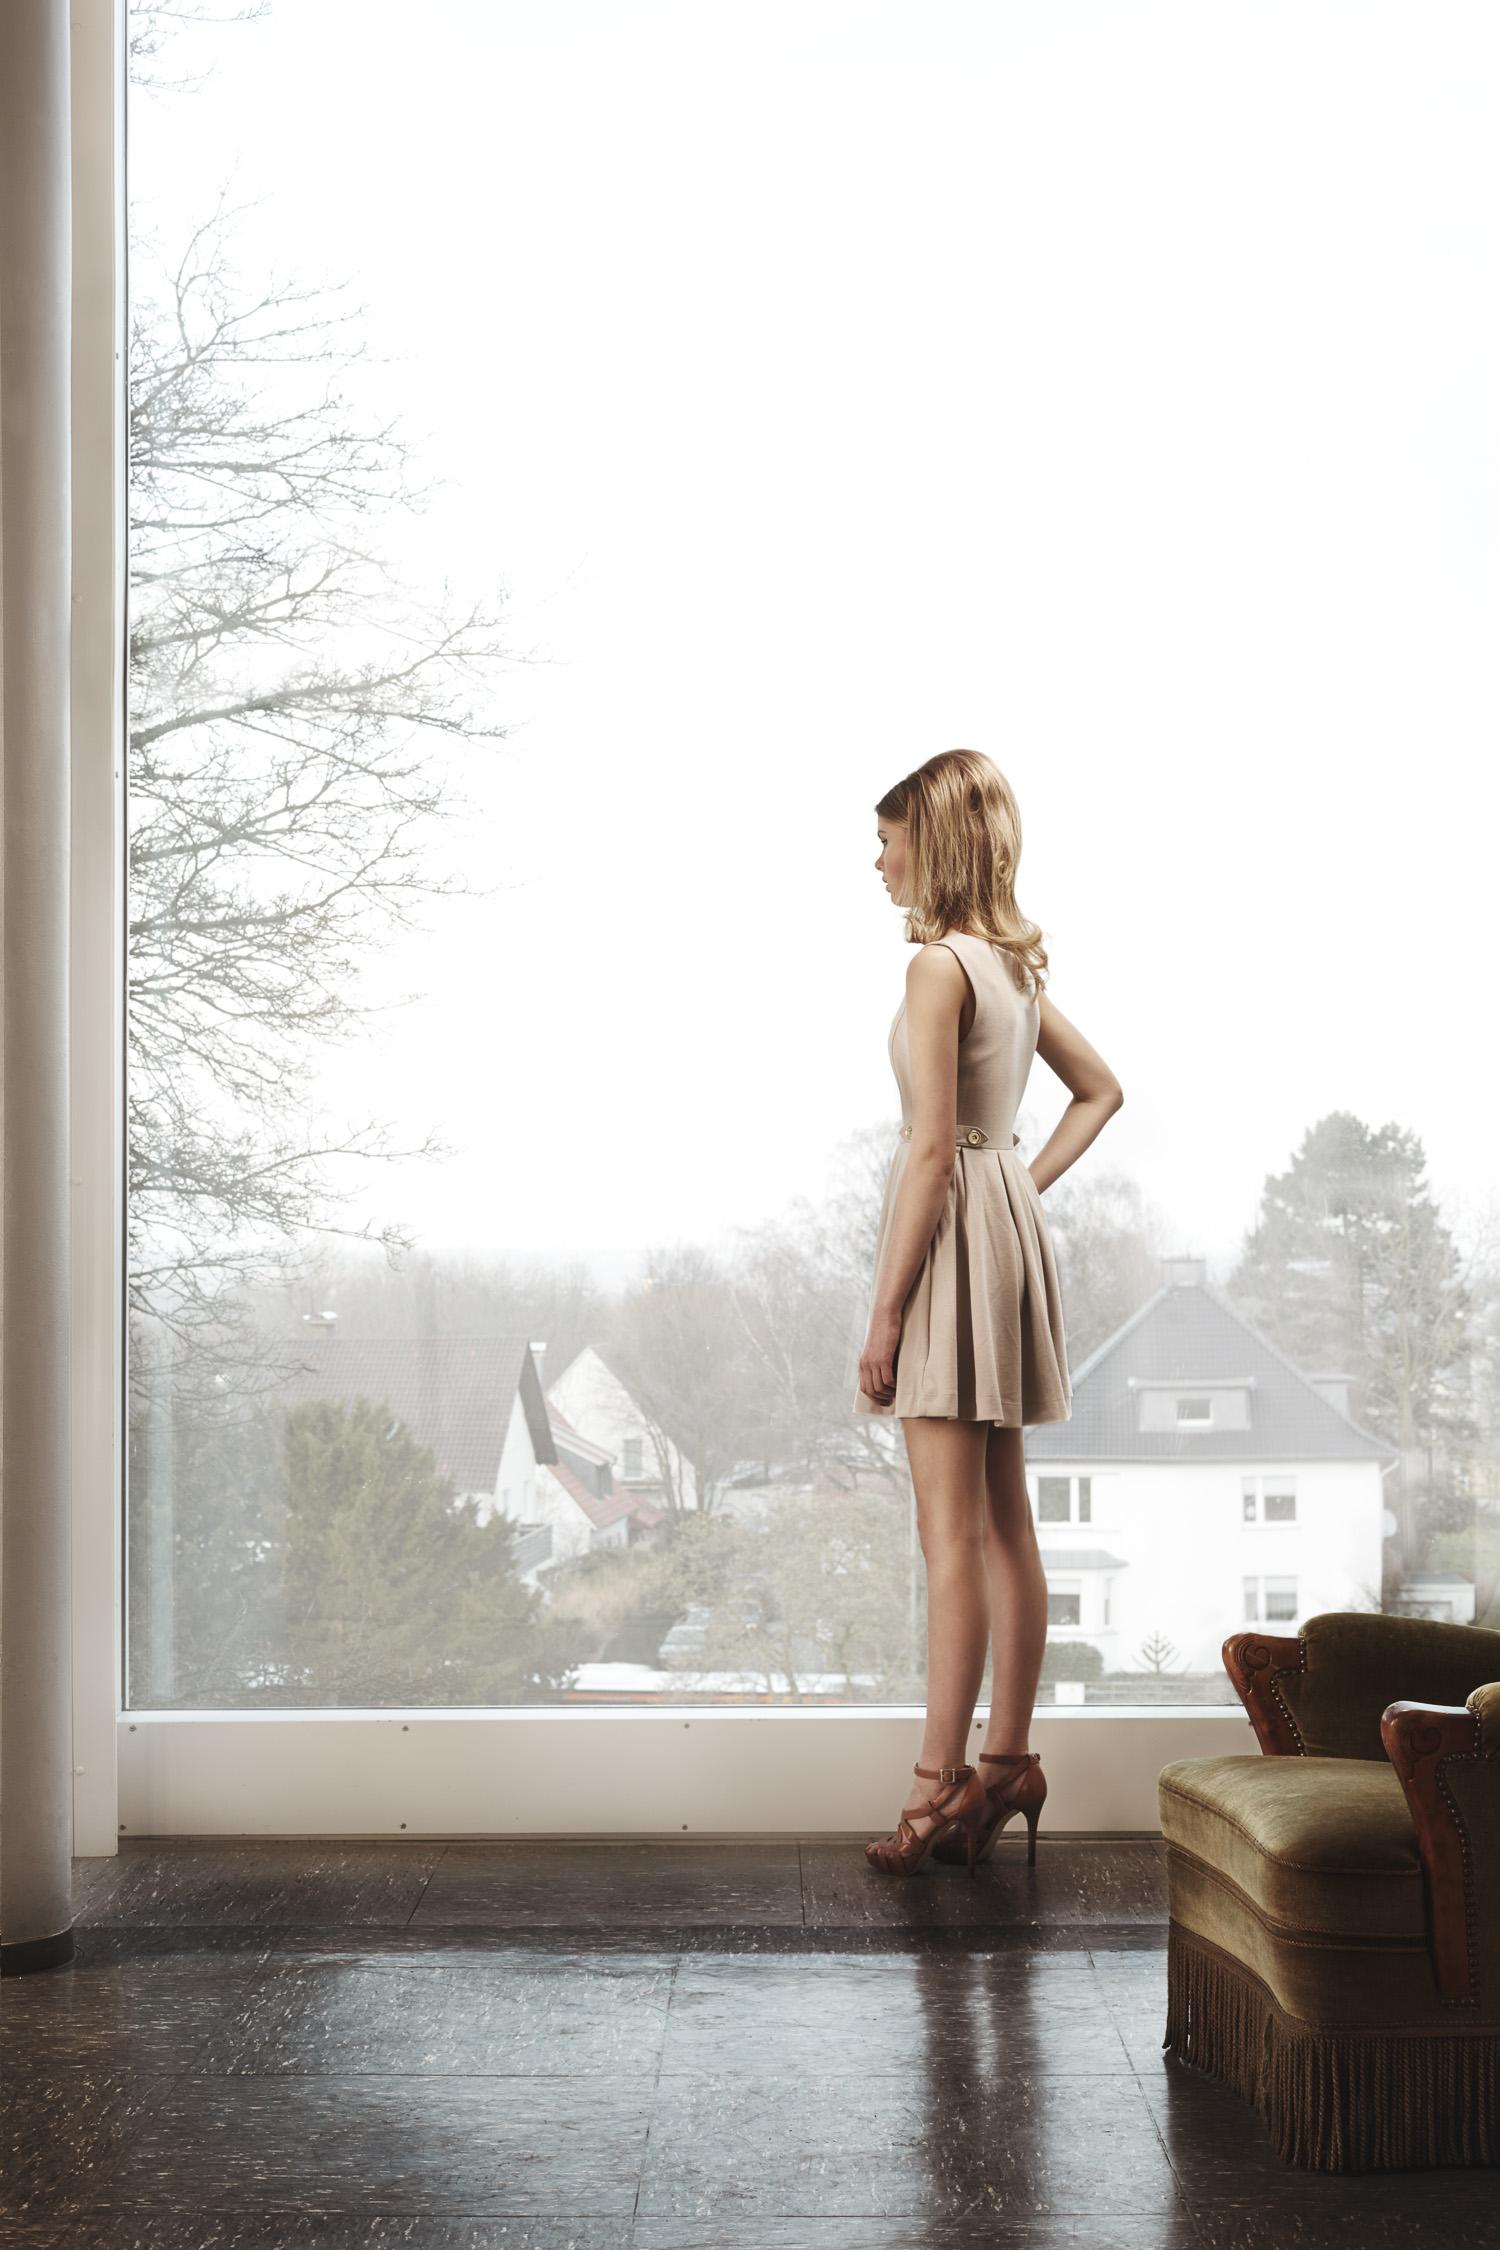 celine-wiemann-fotograf-bielefeld-portrait-tim-ilskens--1.jpg